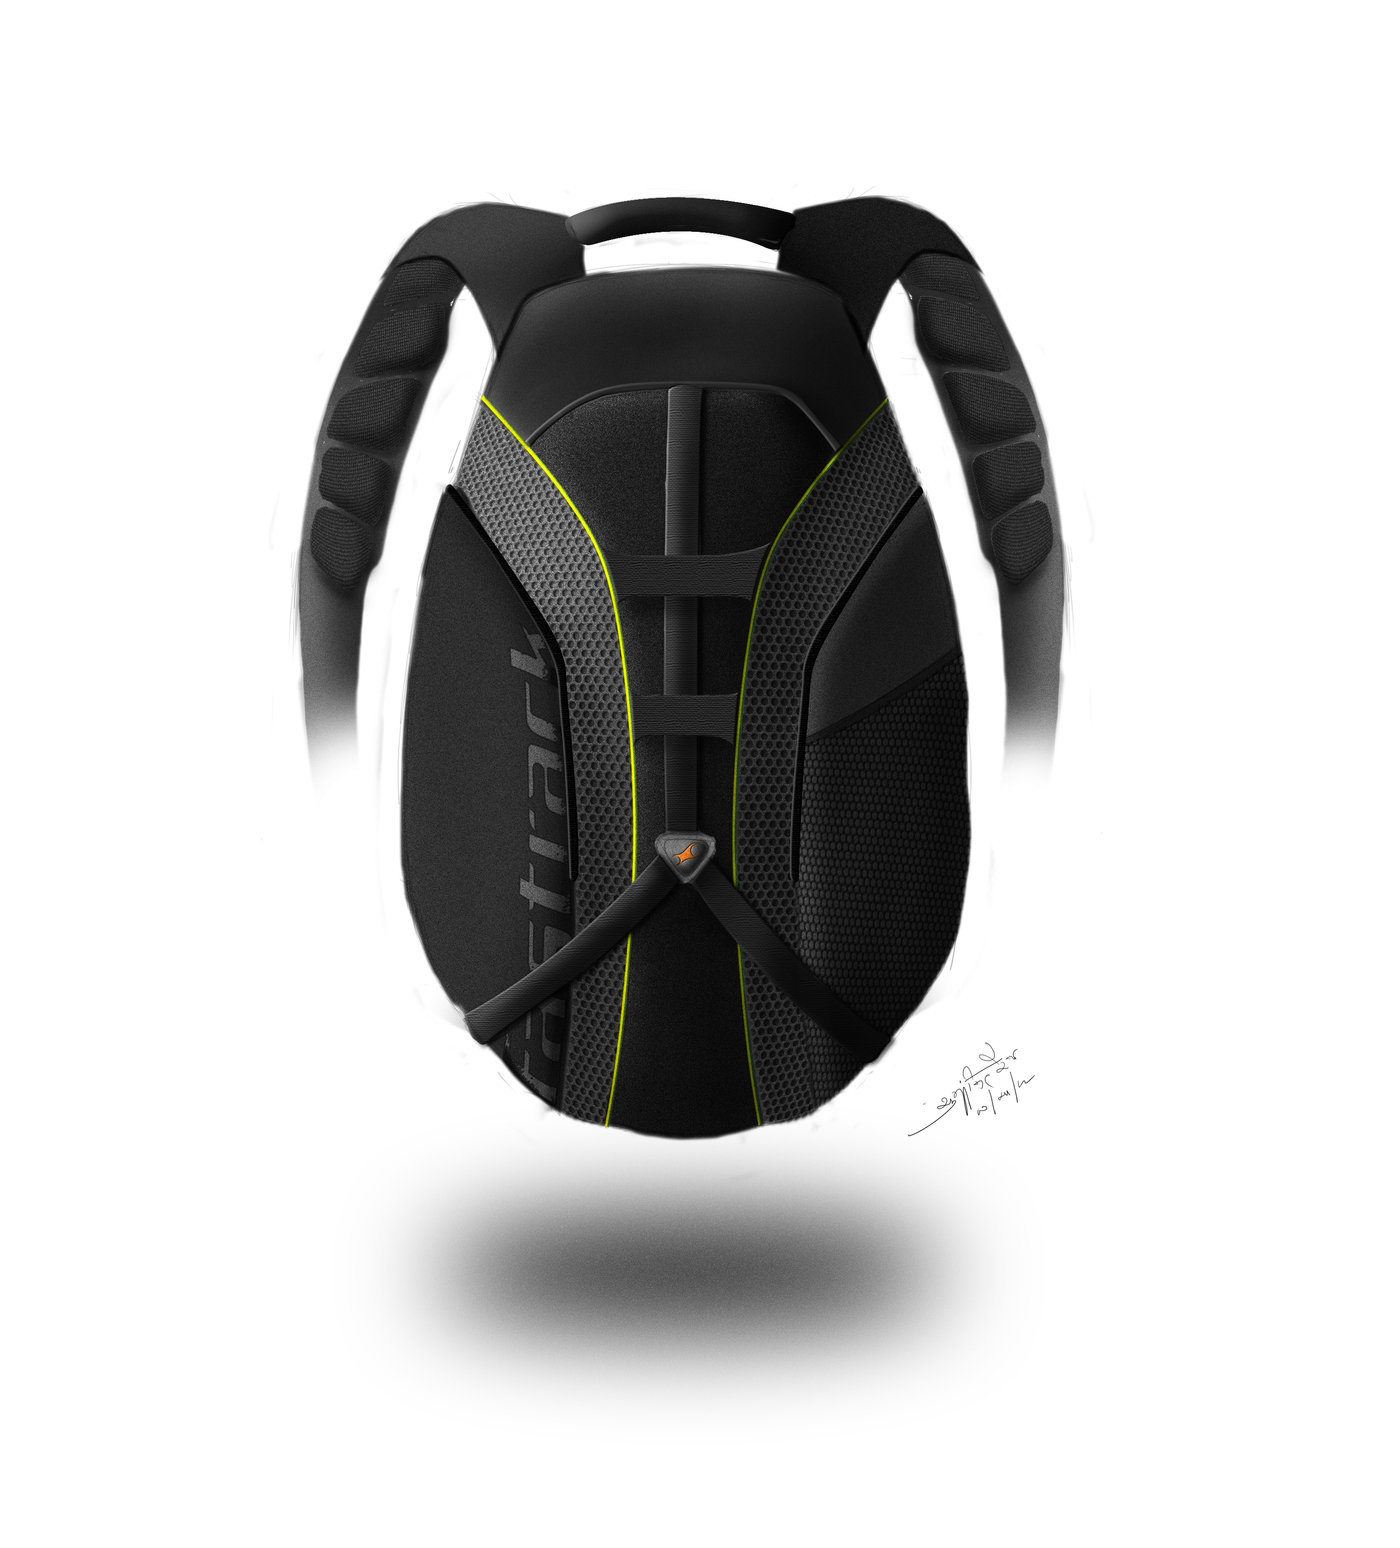 Bags-Titan Design Studio/Fastrack by shubhankit raina at ...